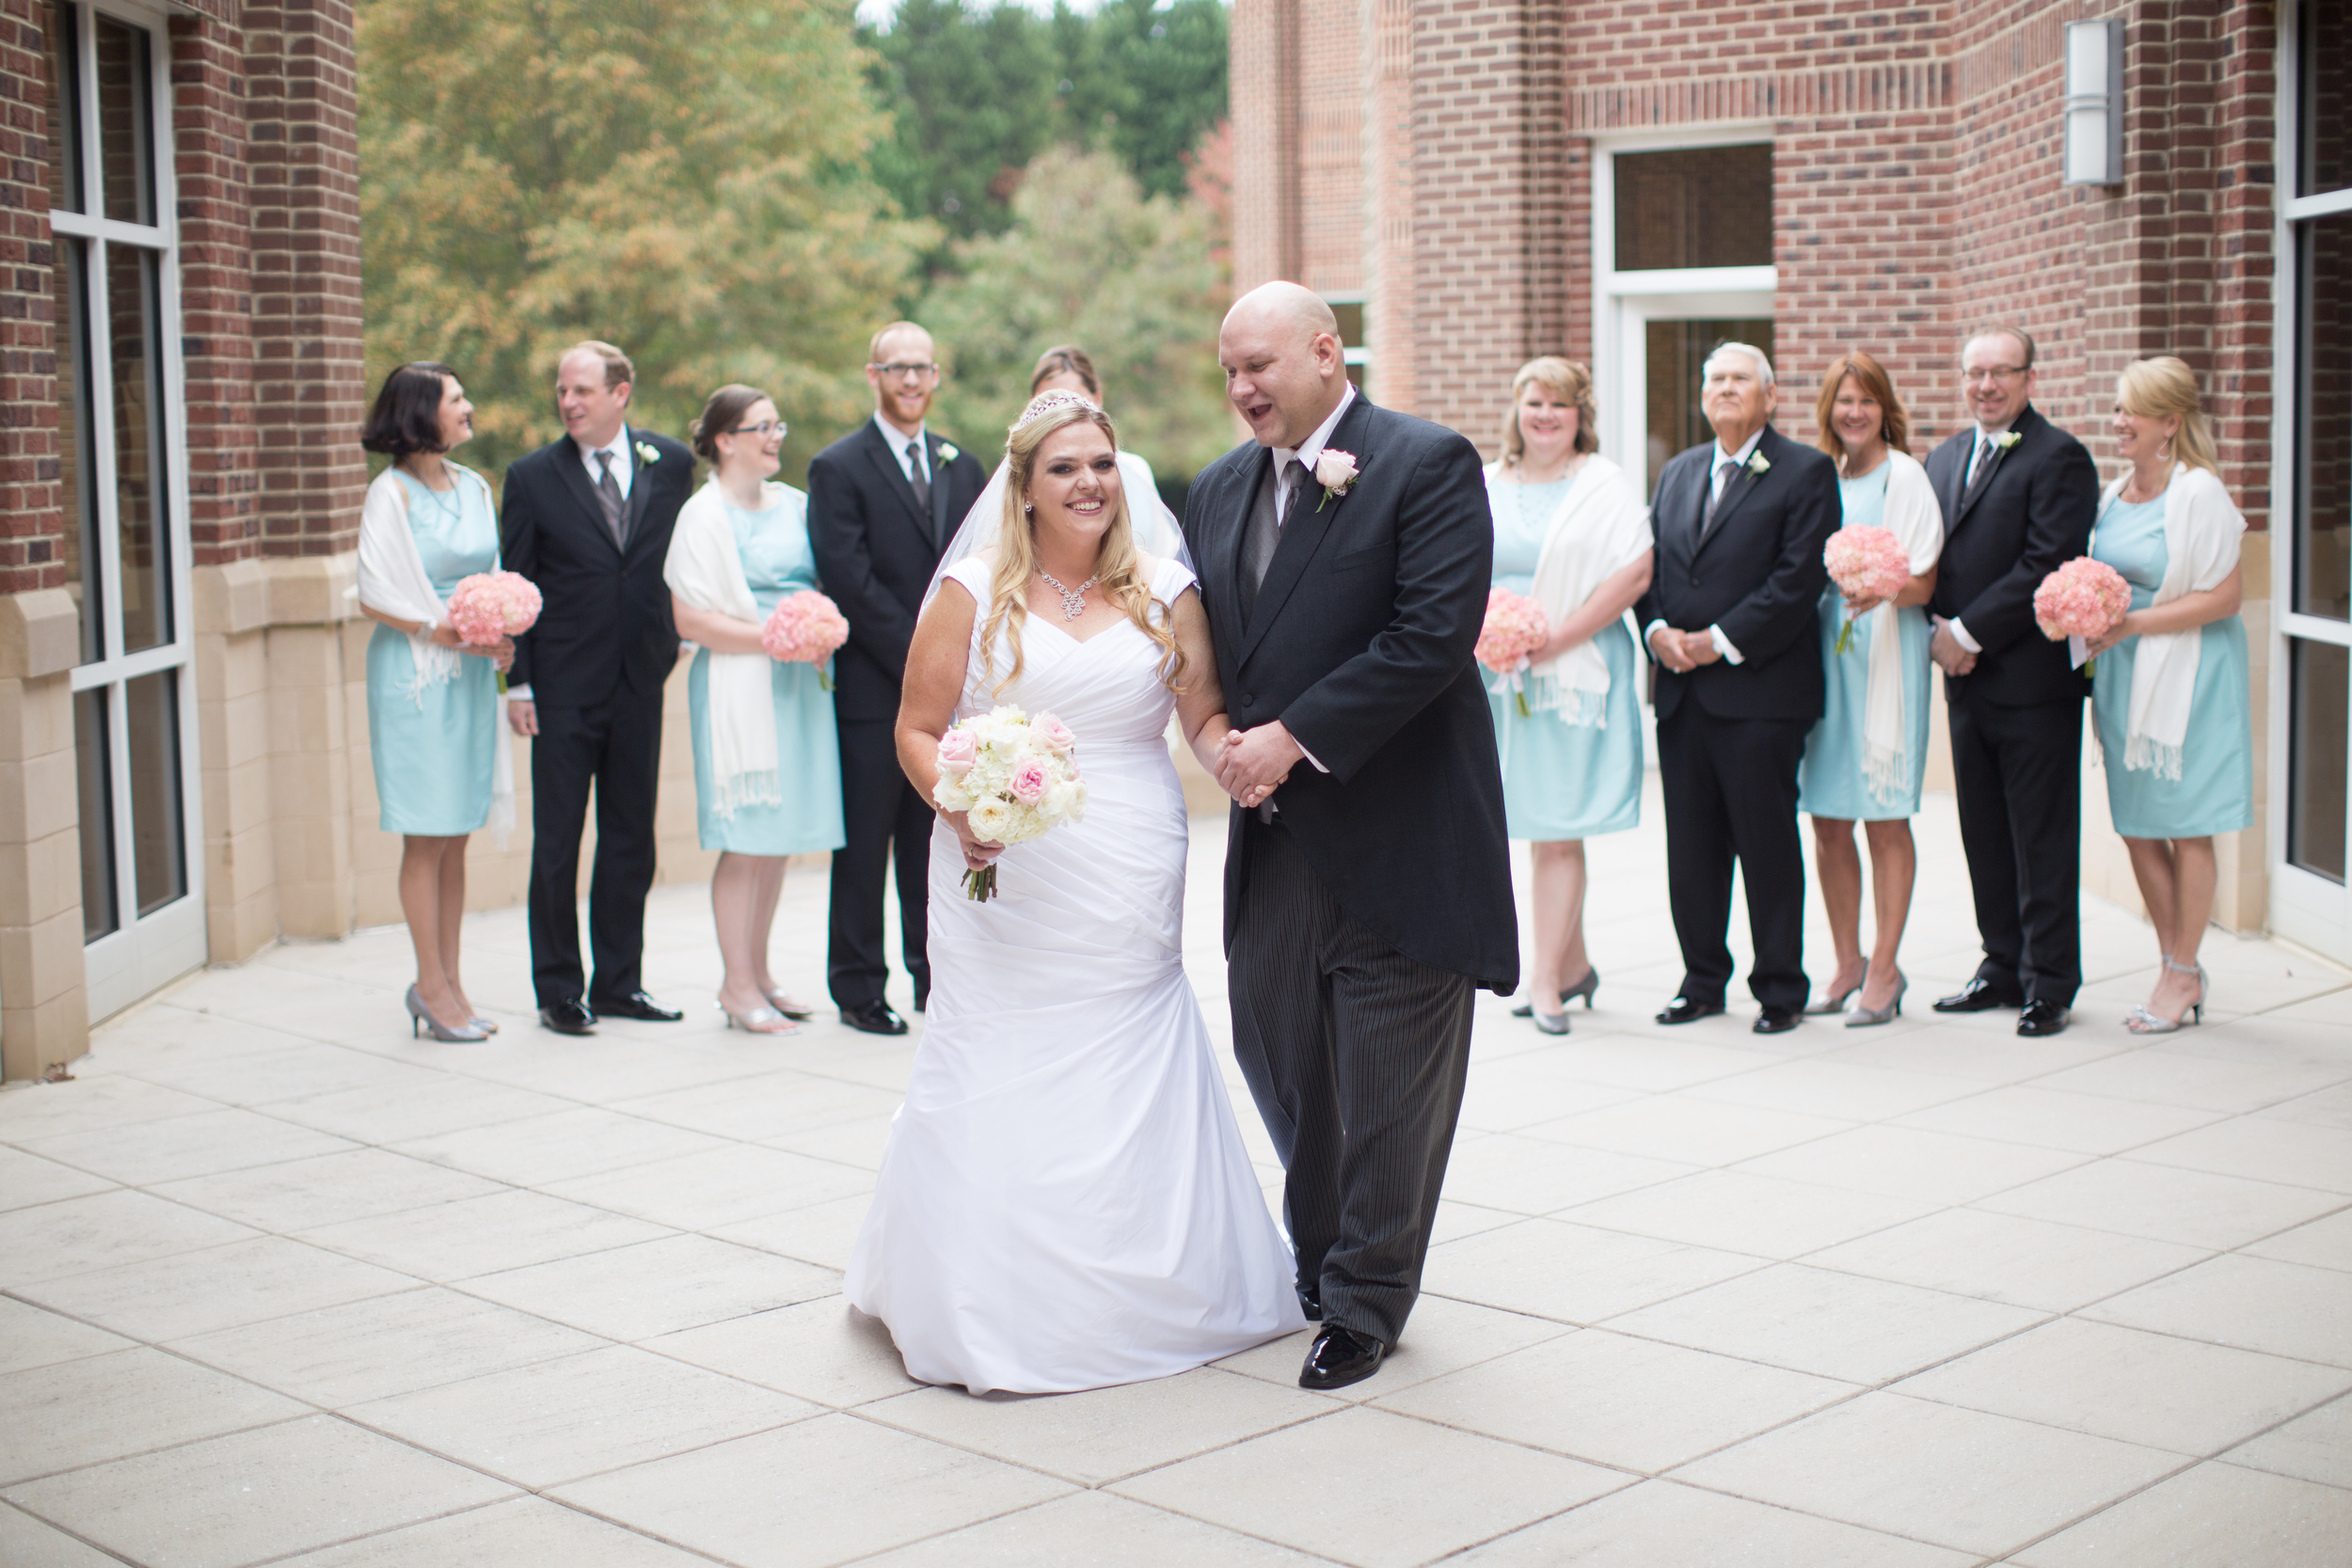 Hough_Wedding_North_Carolina_Charlotte_JonCourvillePhotography-362.jpg